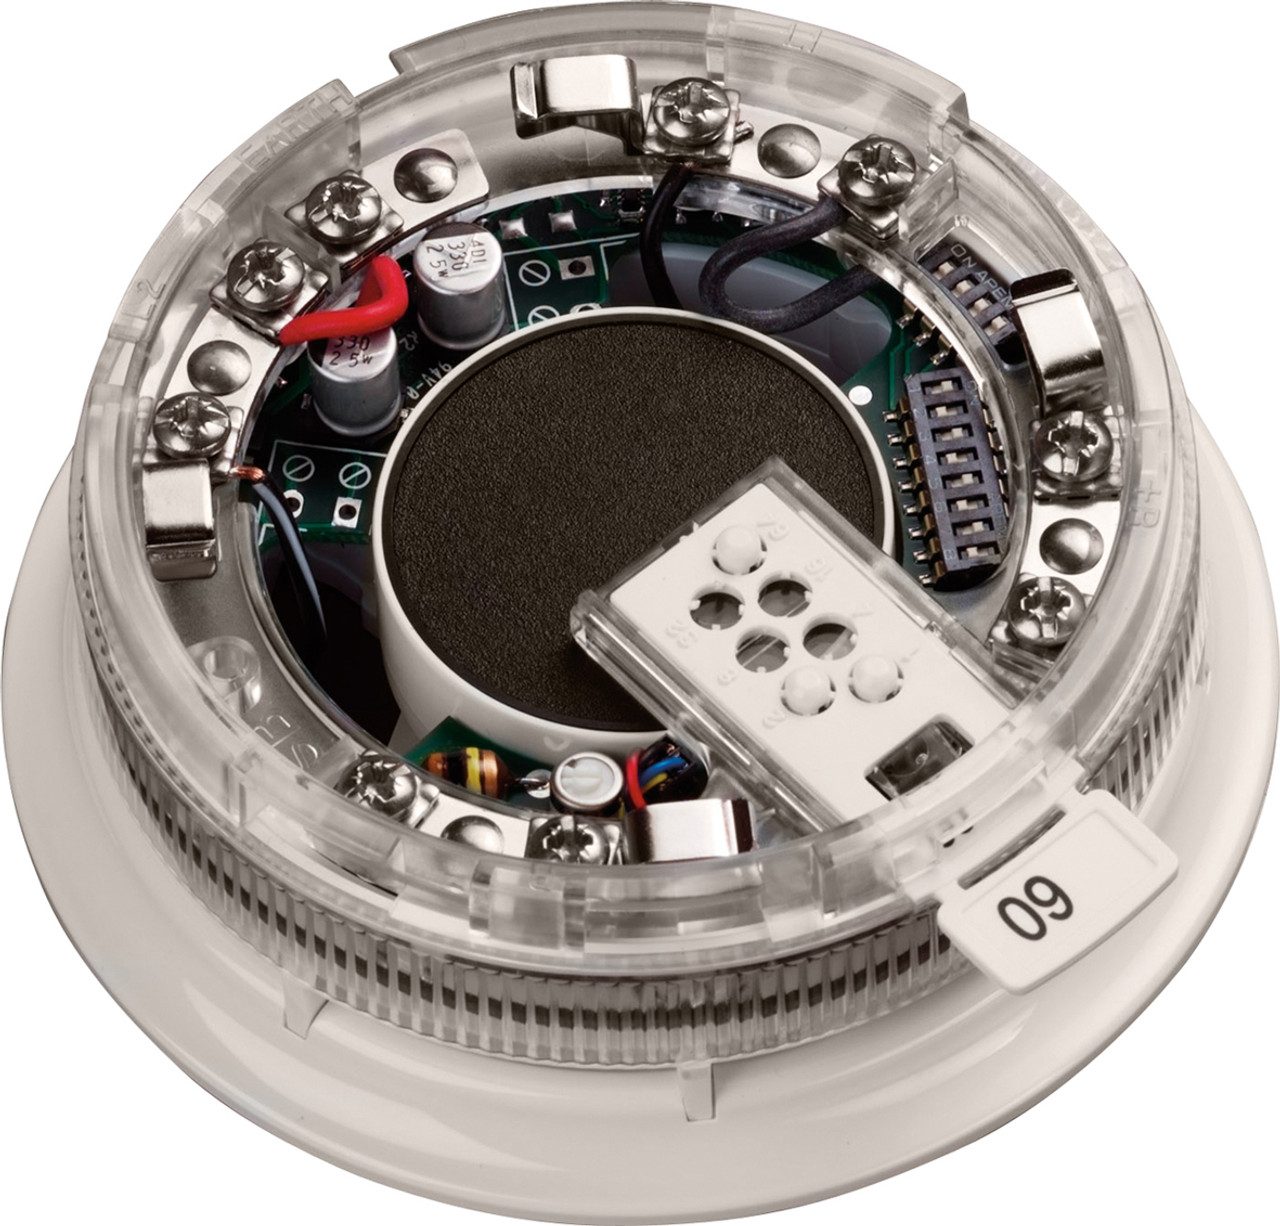 28.80 Apollo XP95 Discovery Multisensor